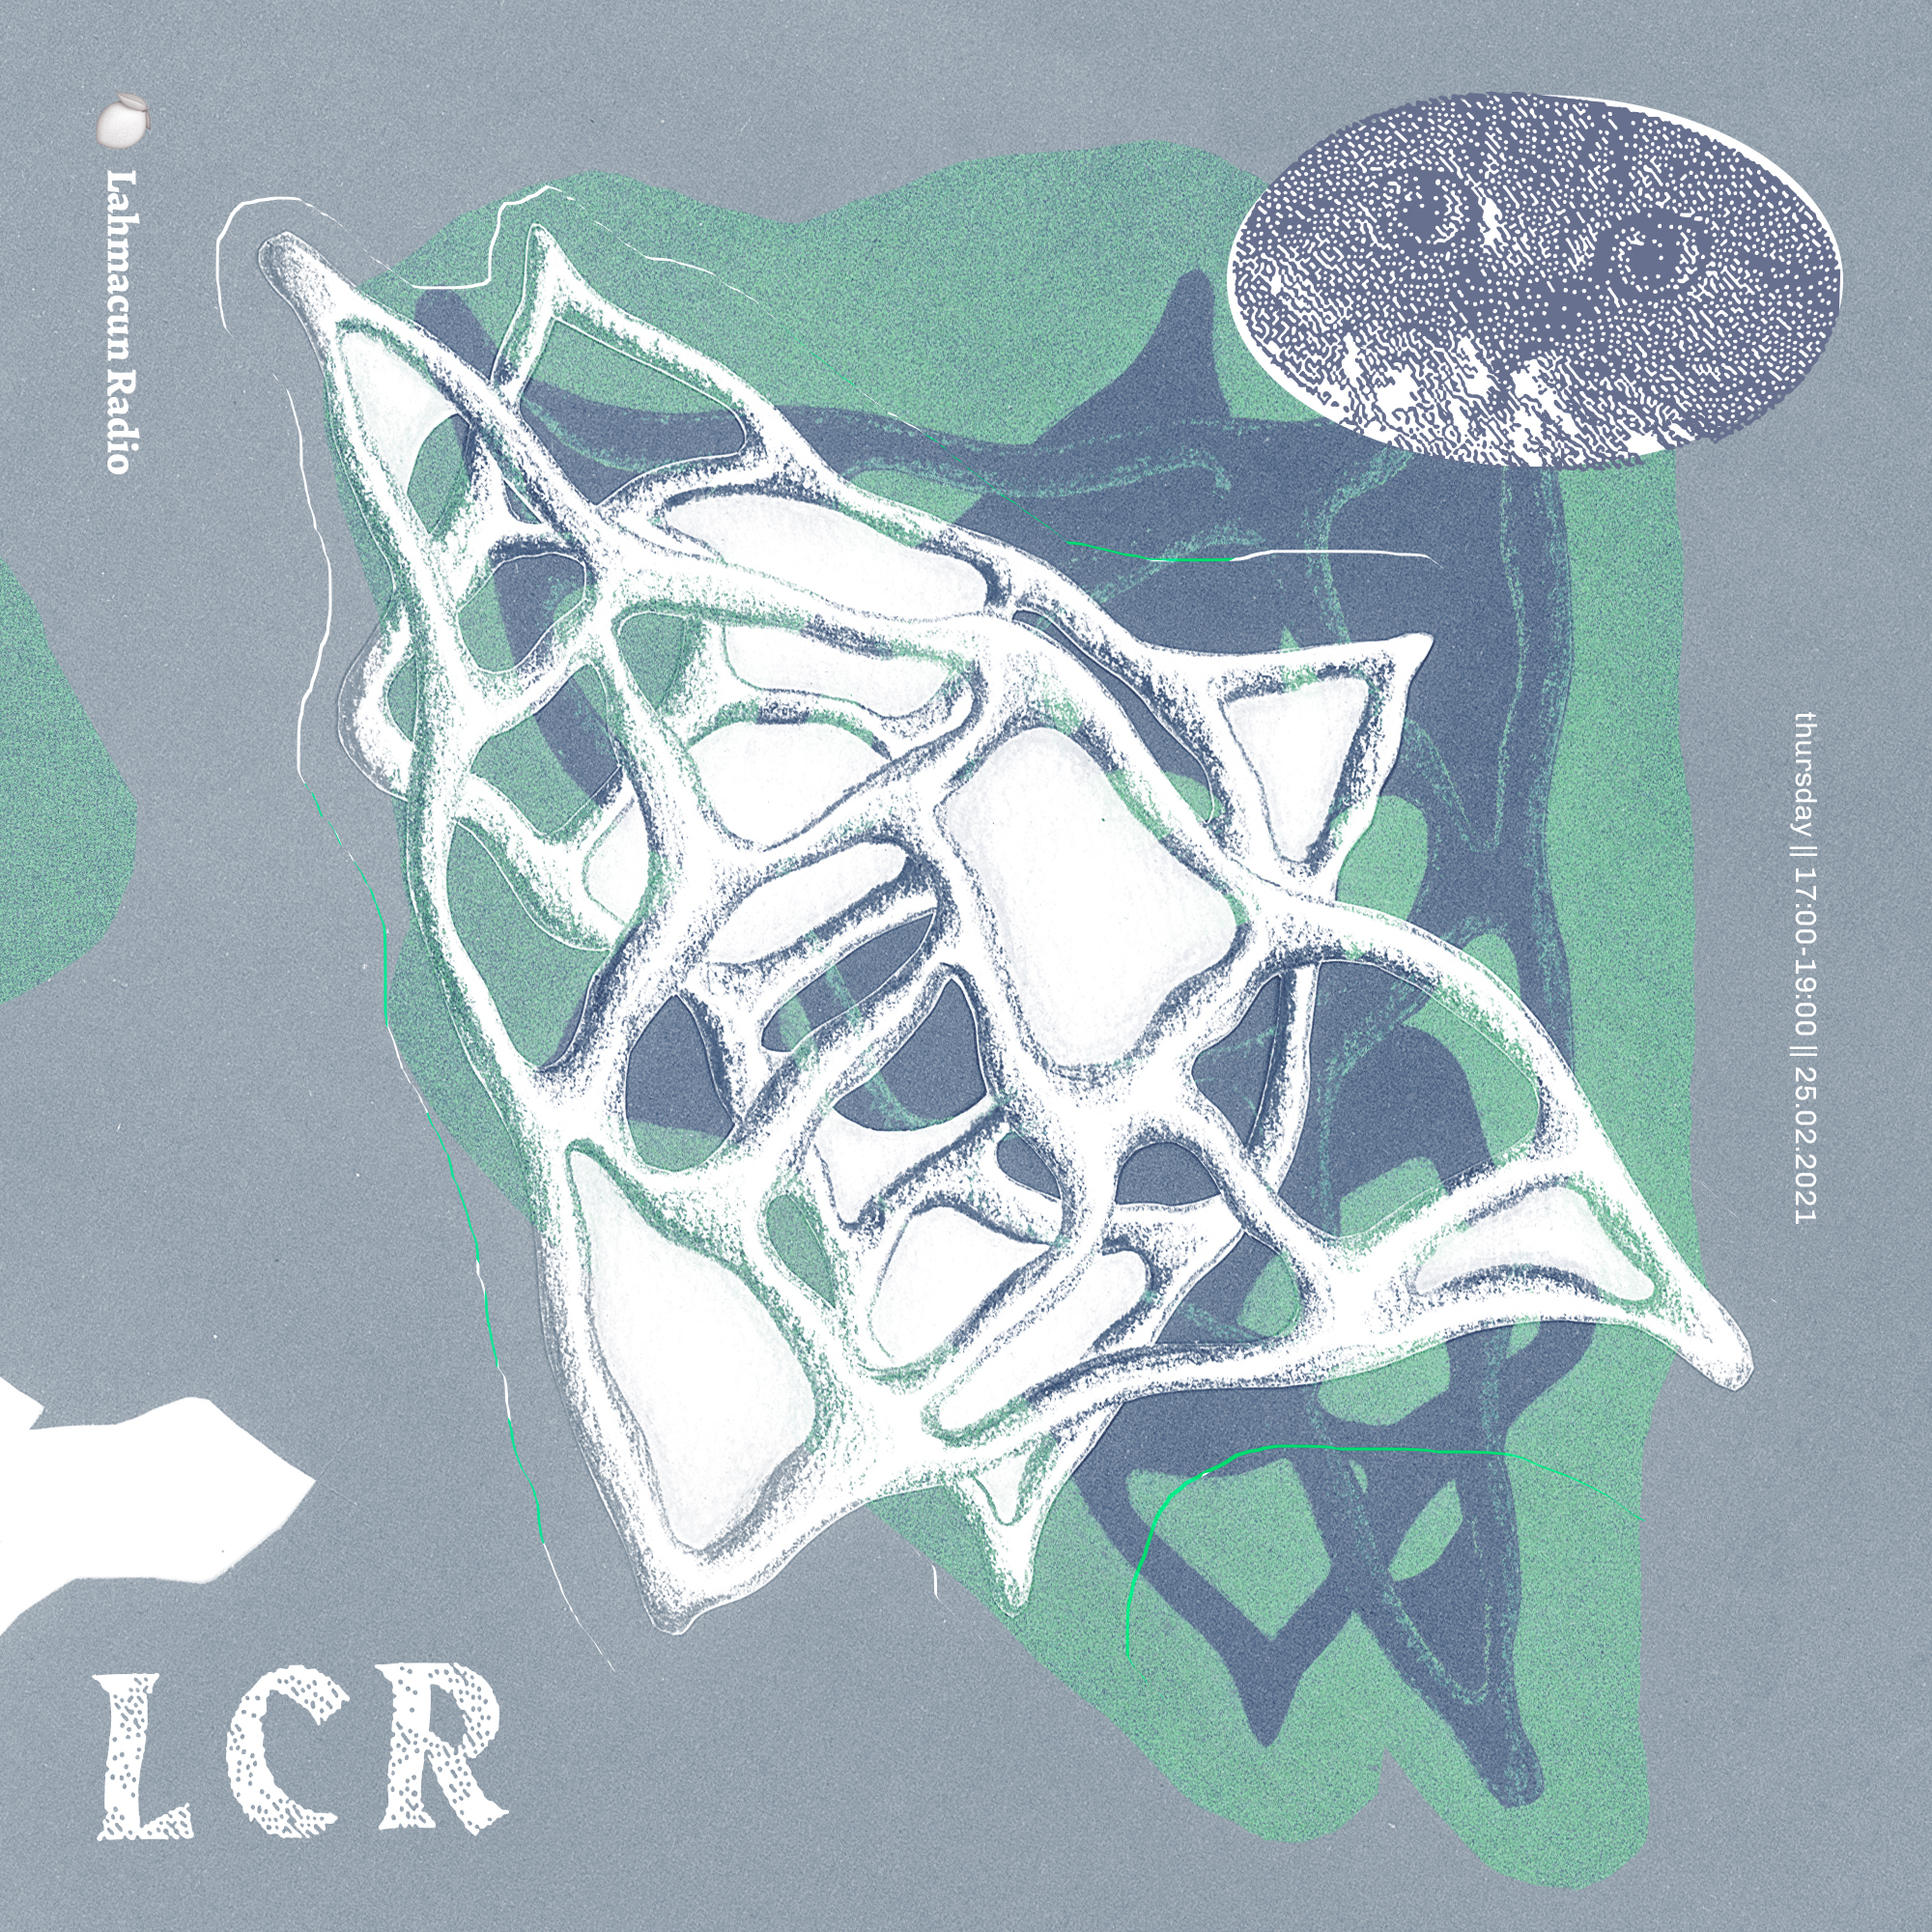 LCR @ Lahmacun Radio /// Inhale, Excel /// [25.02.21.]